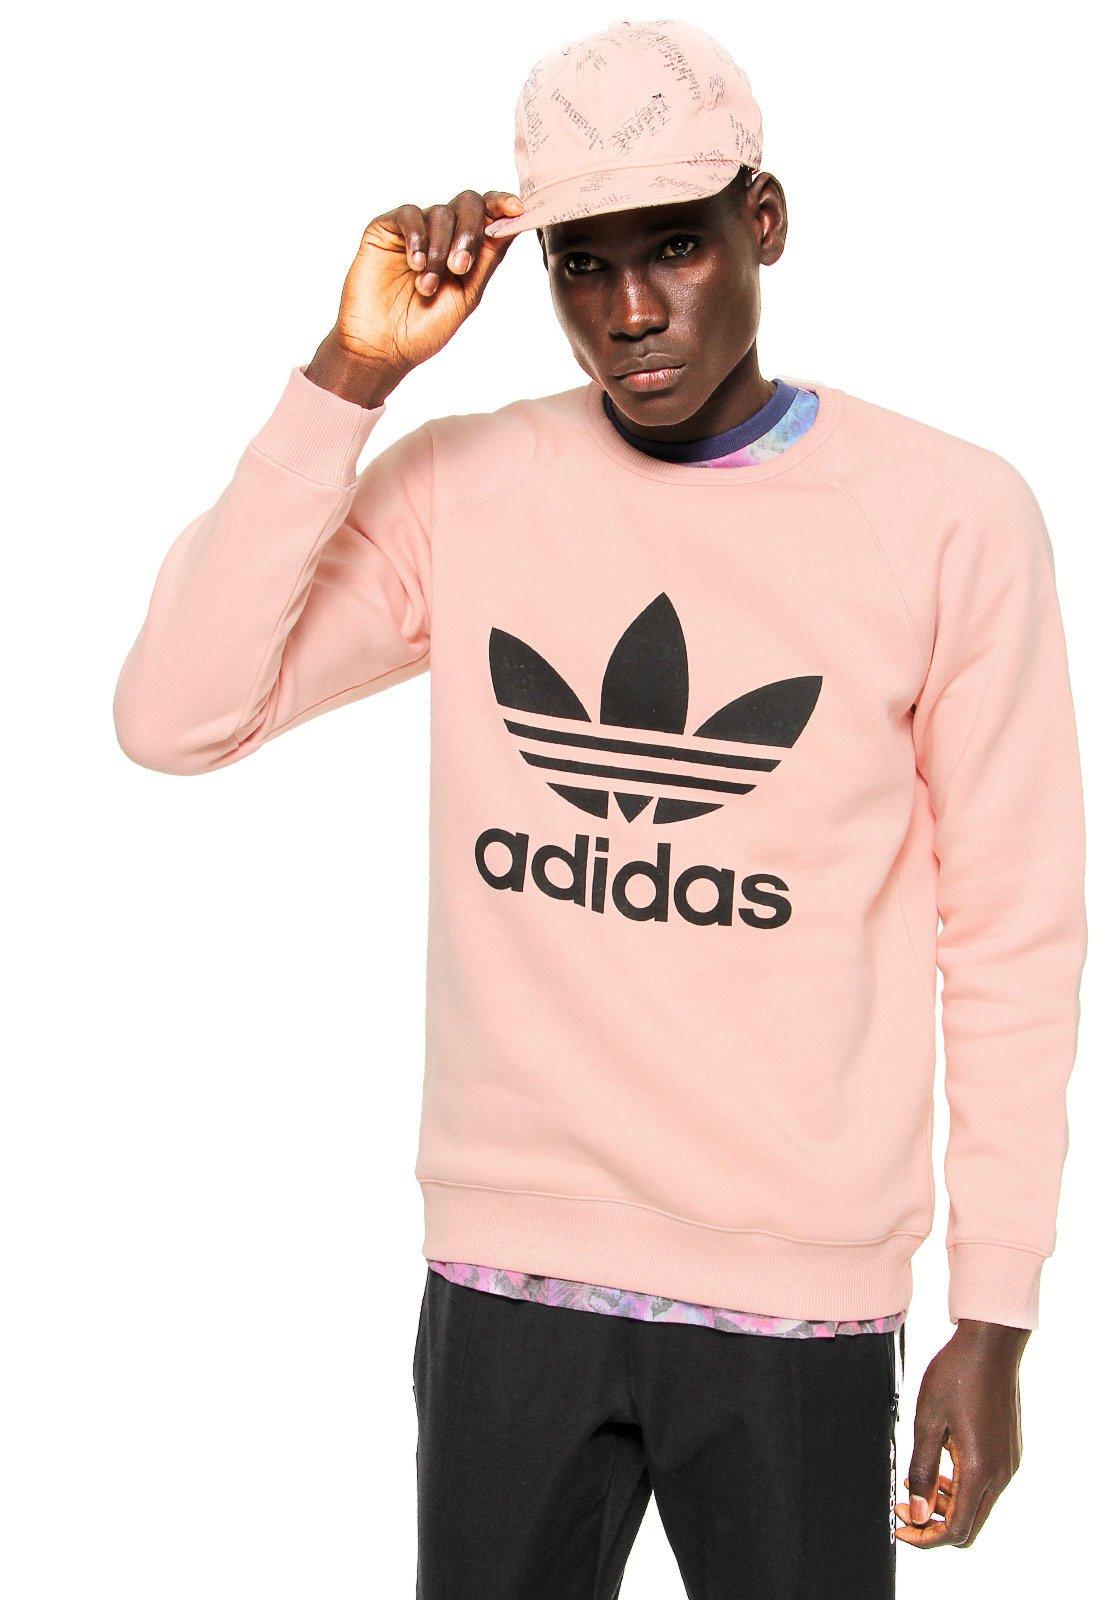 On Sale adidas Originals Trefoil Crew Sweatshirt Pink For